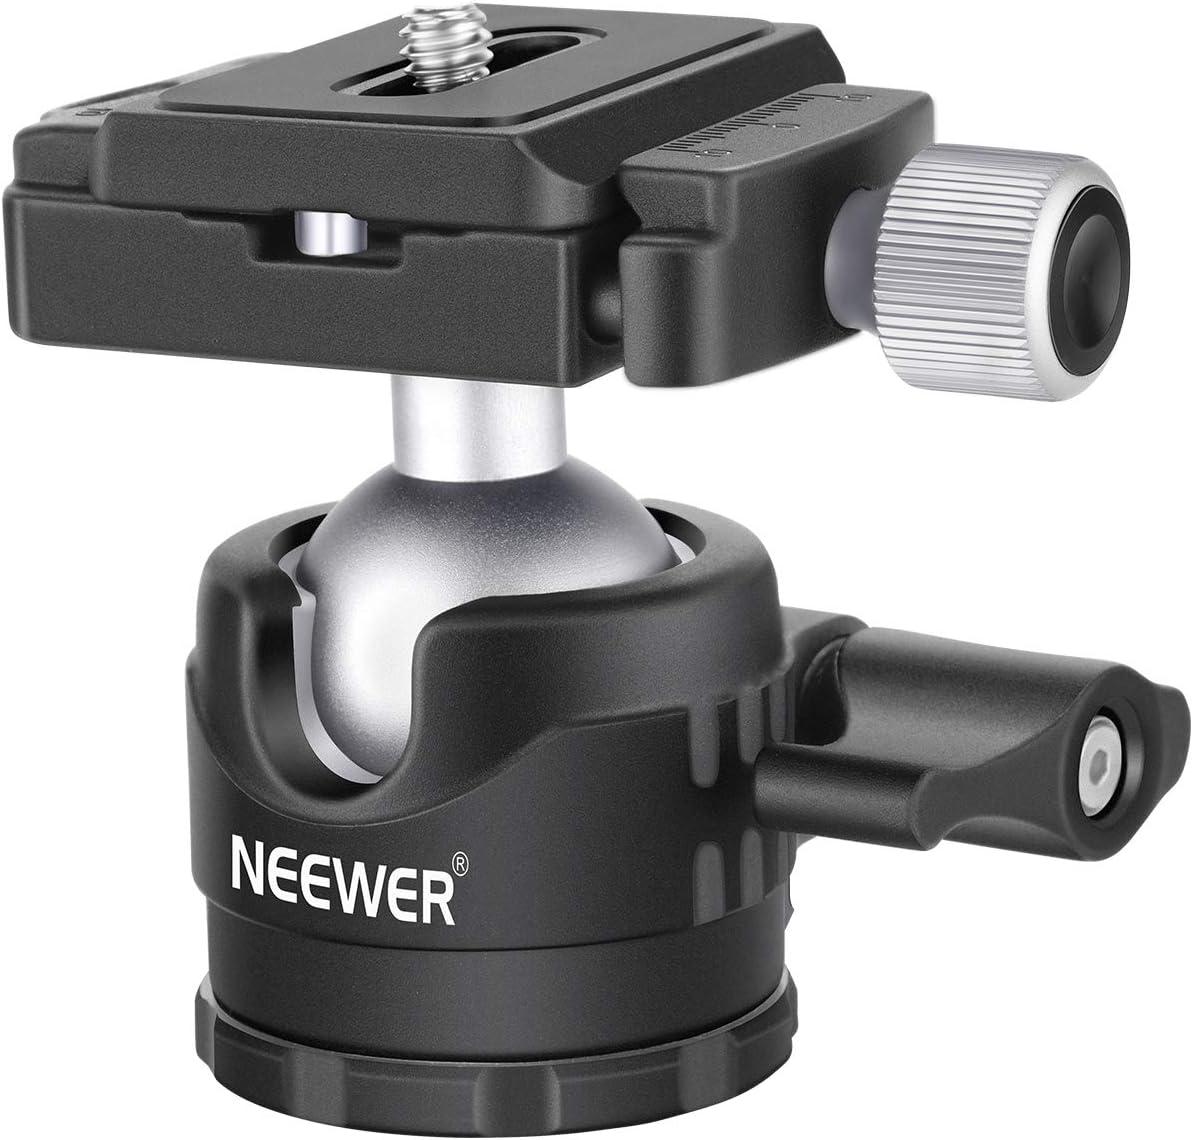 Neewer Niedrige Profile Kugelkopf 360 Grad Drehbarer Kamera